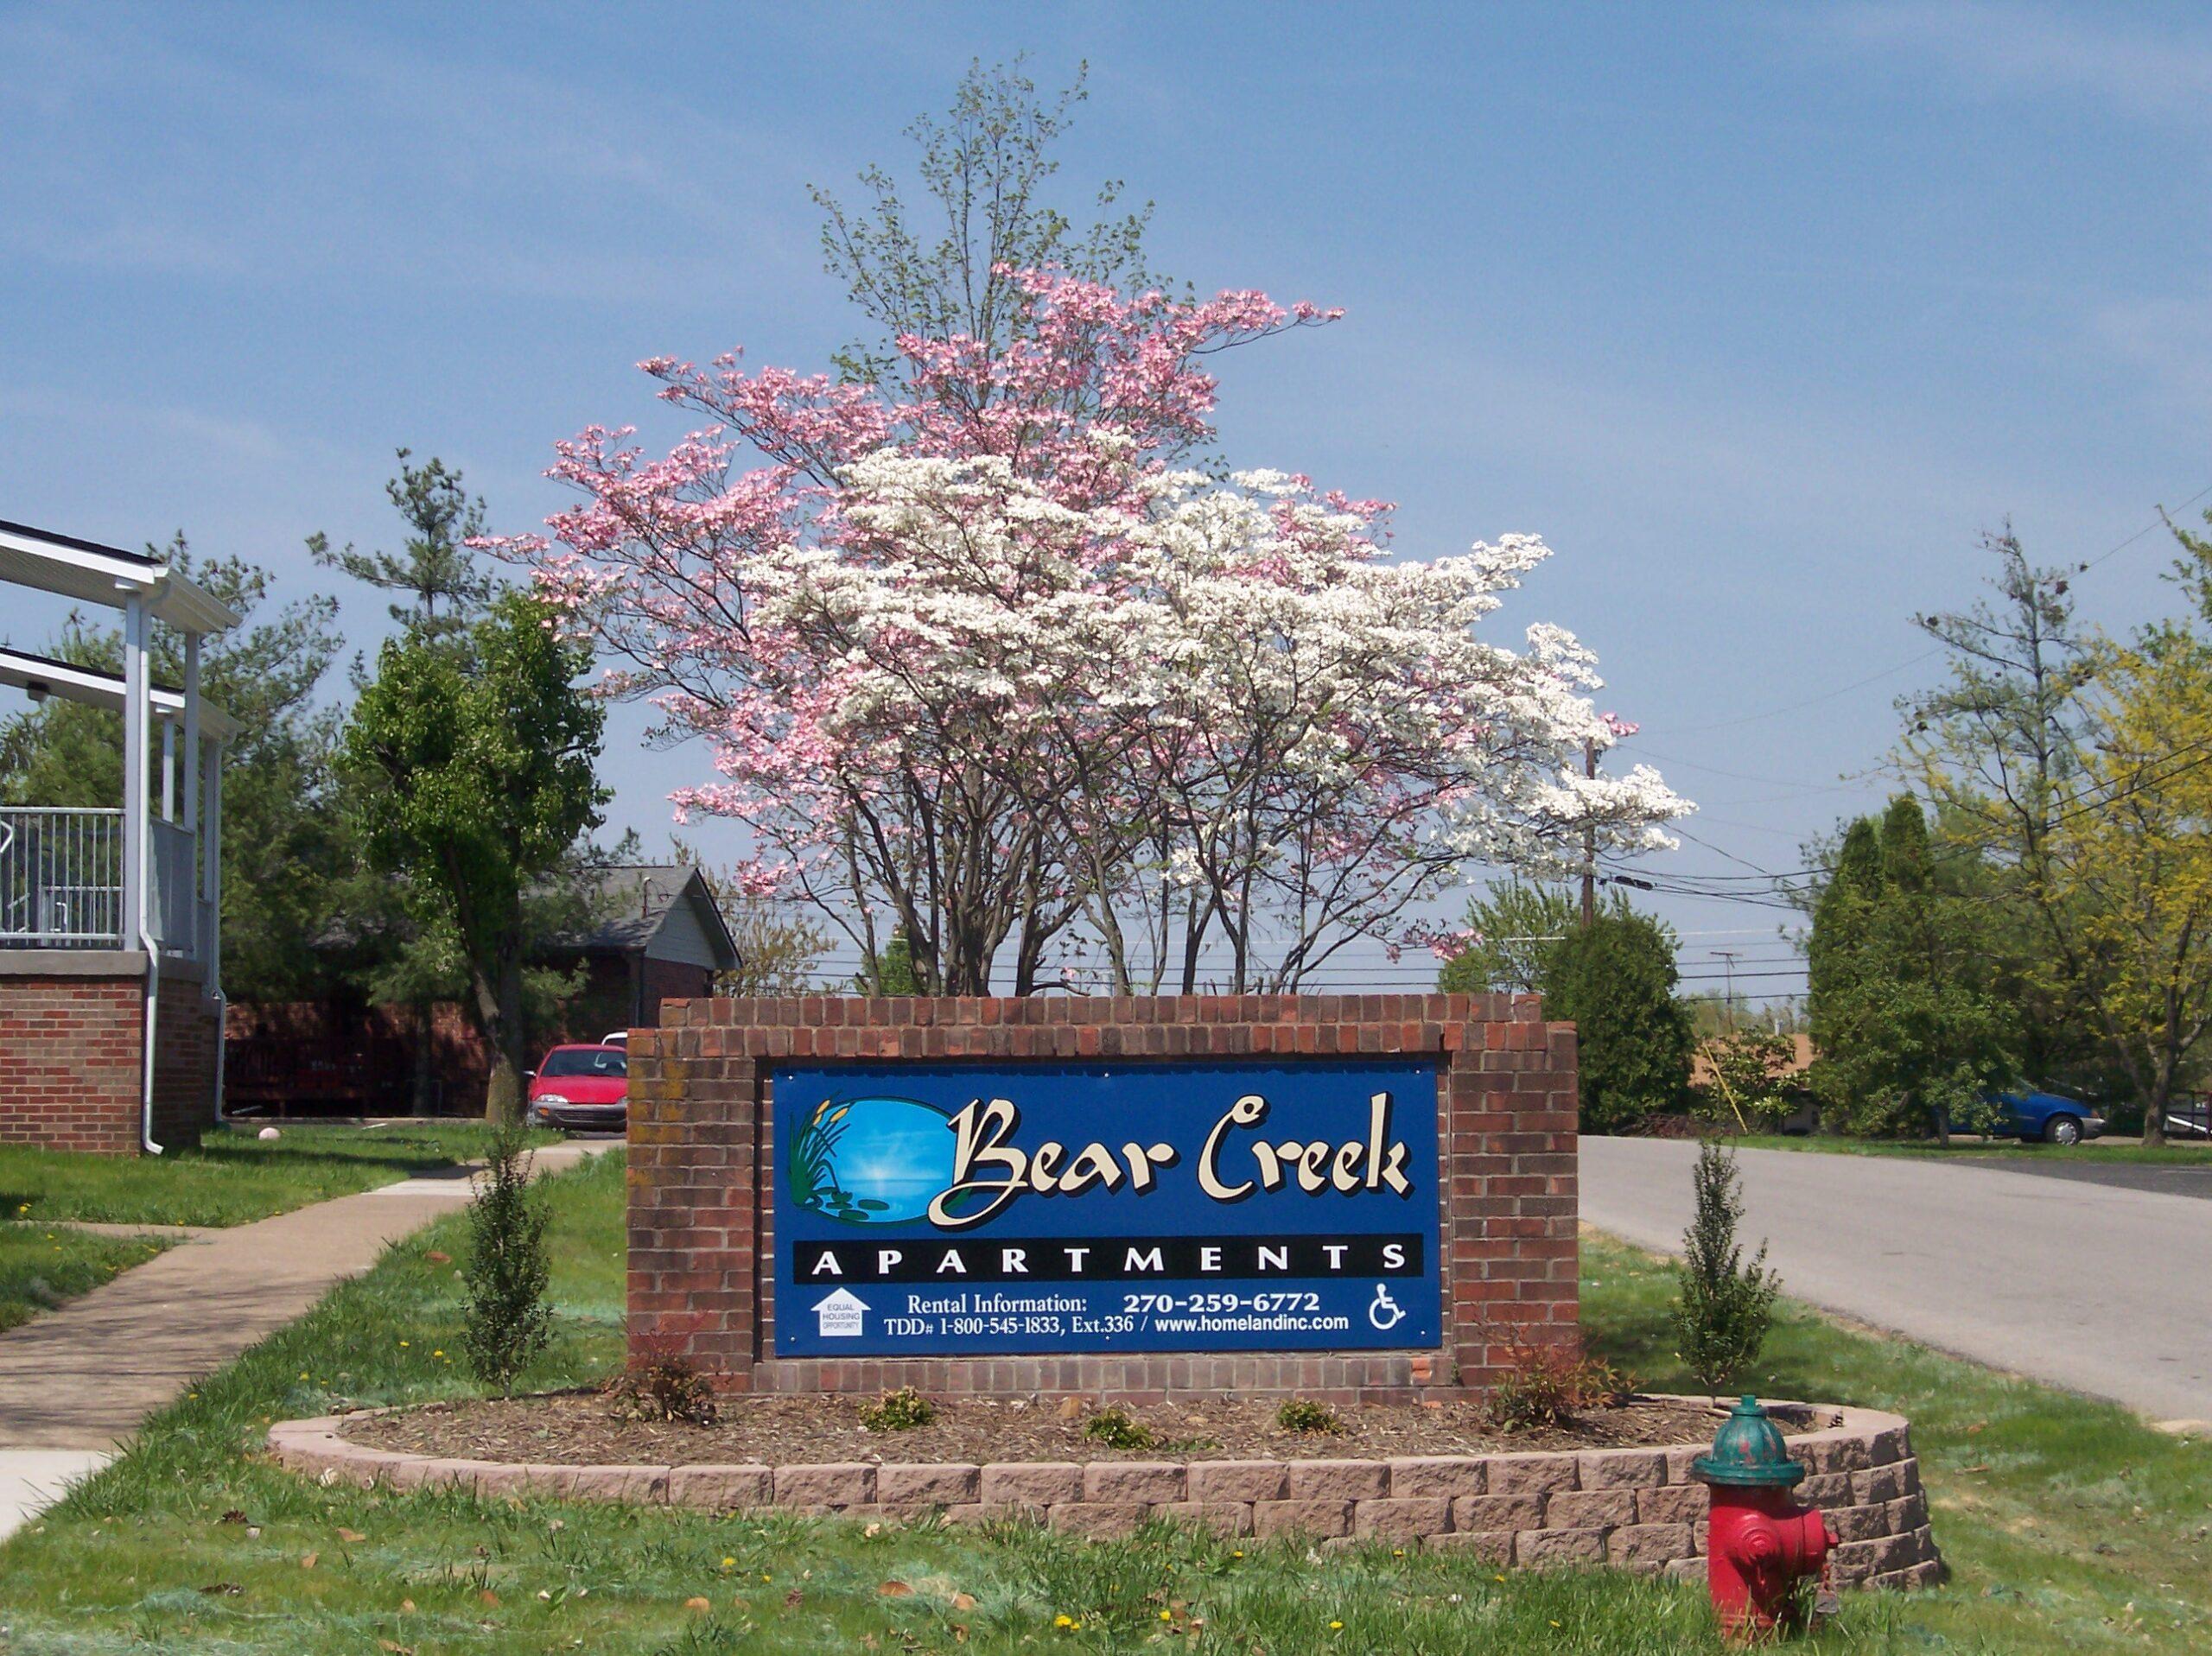 Bear Creek Apartments